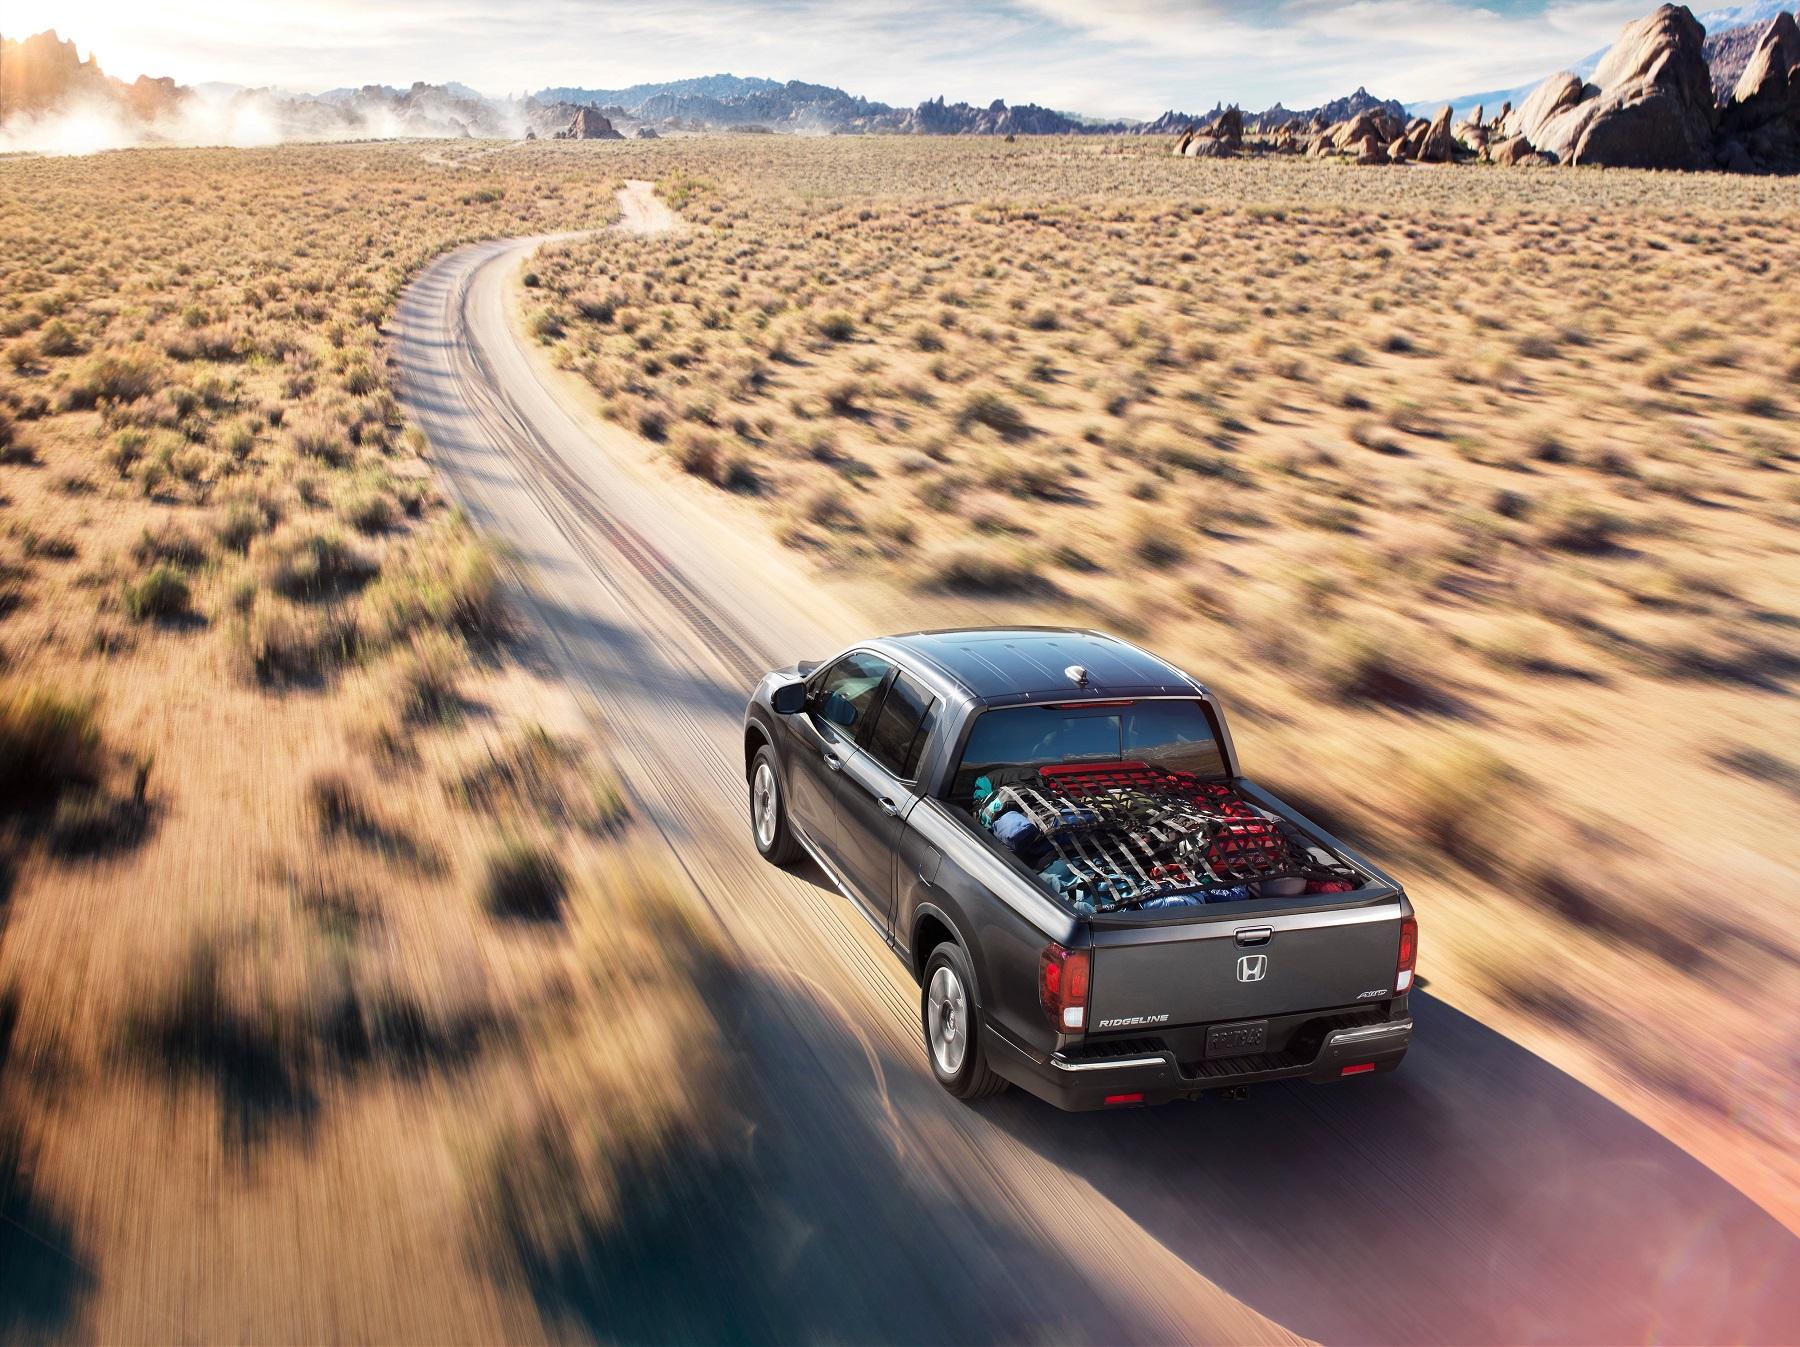 2017 Honda Ridgeline More Capability Versatility Truck Talk